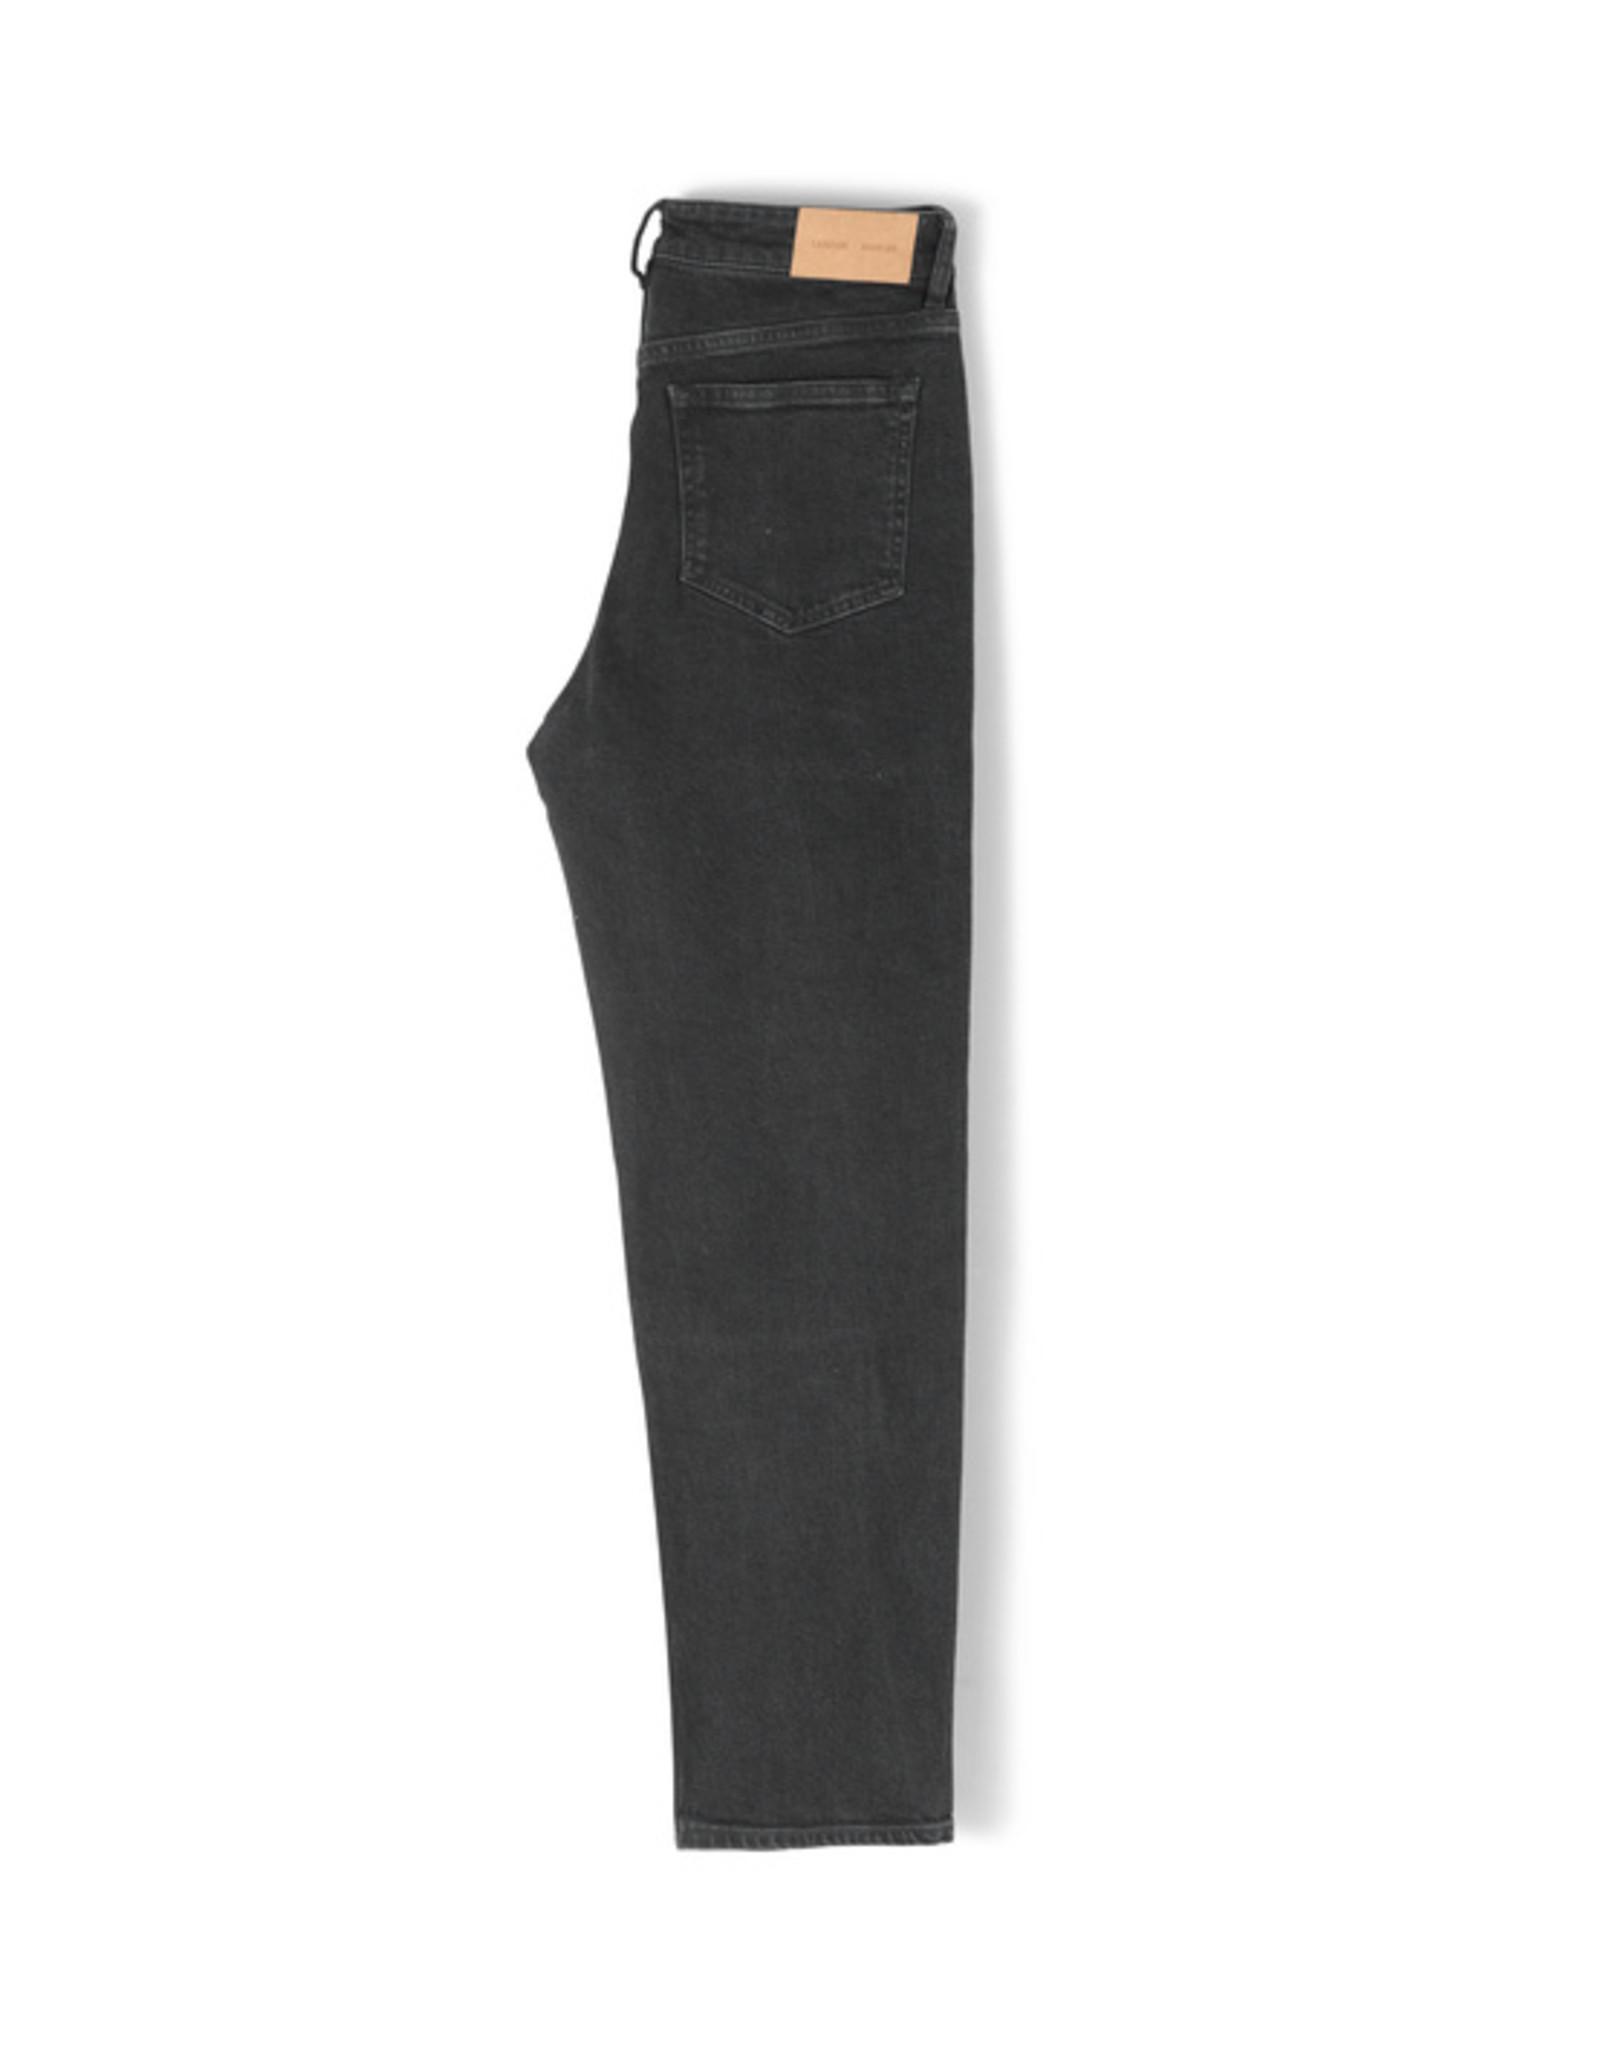 Samsoe & Samsoe Marianne jeans 11356 BLACK ROCK 31